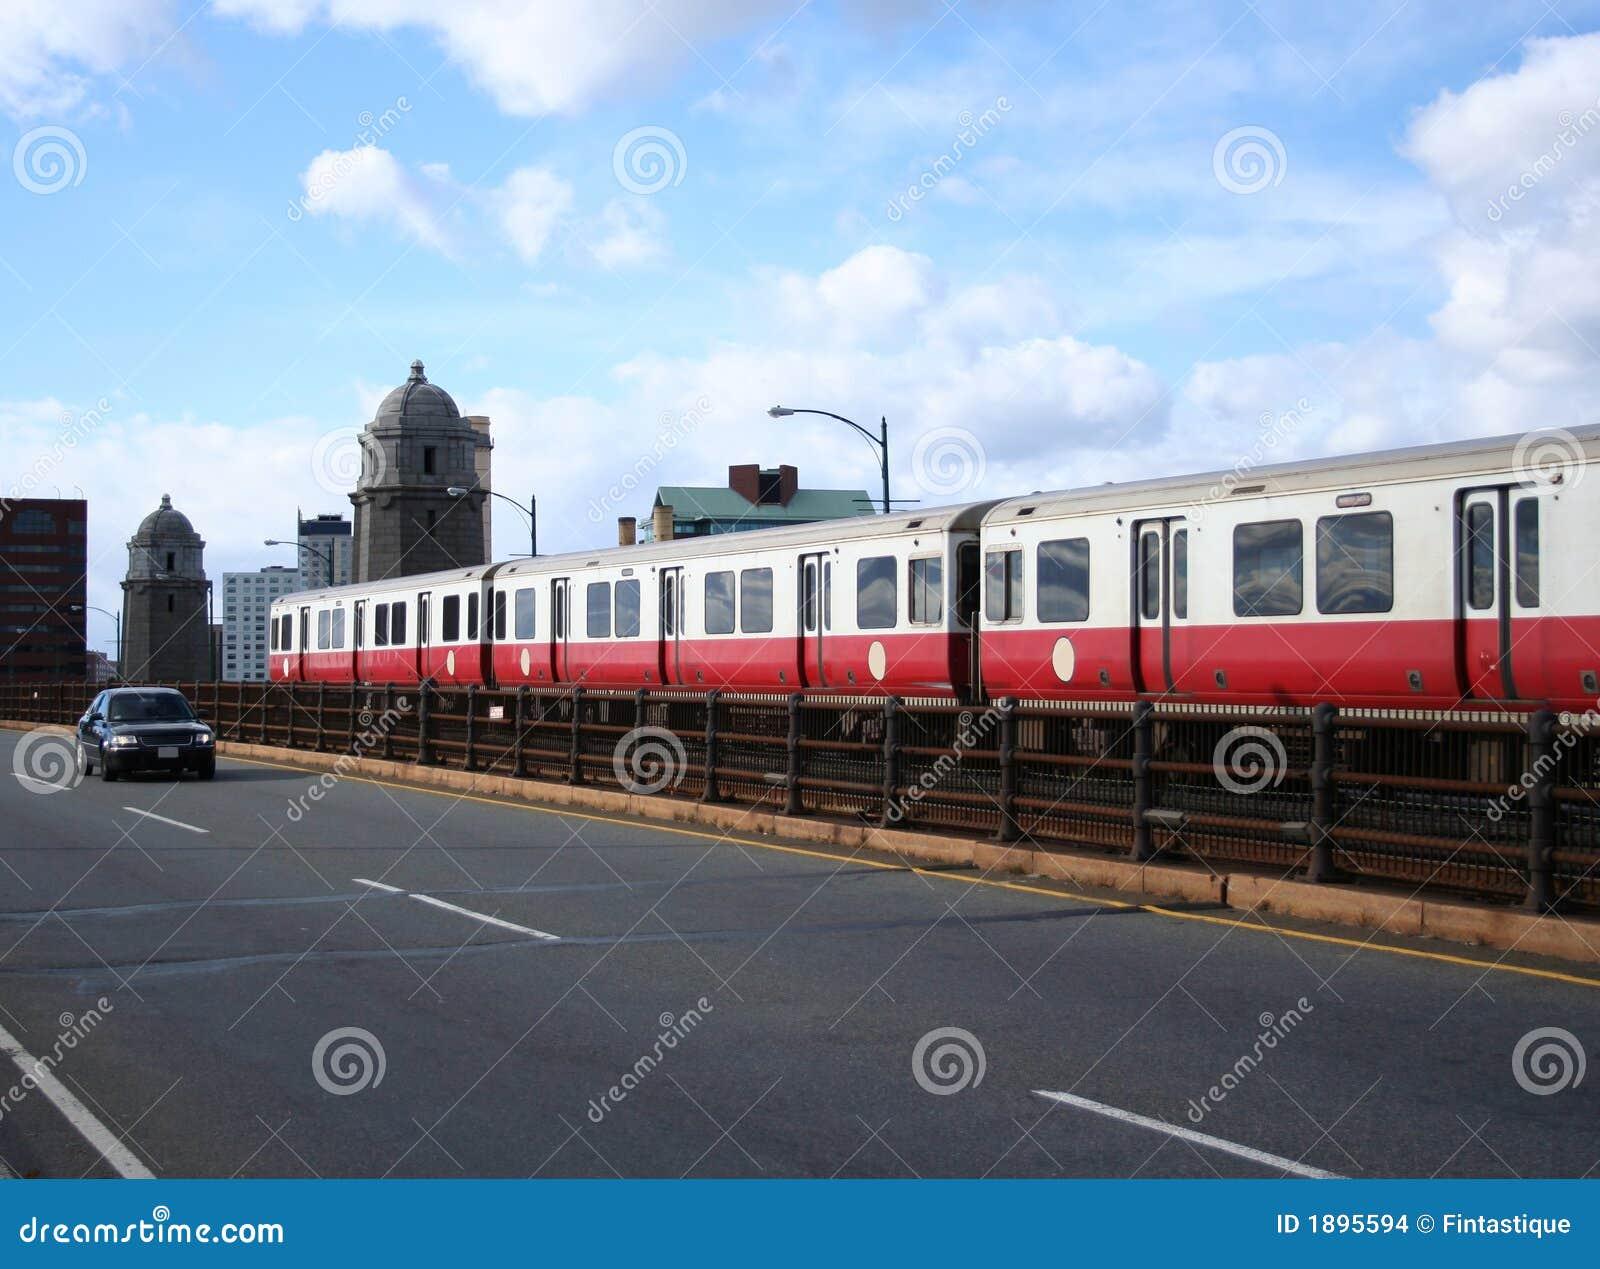 Boston Subway Train Stock Images